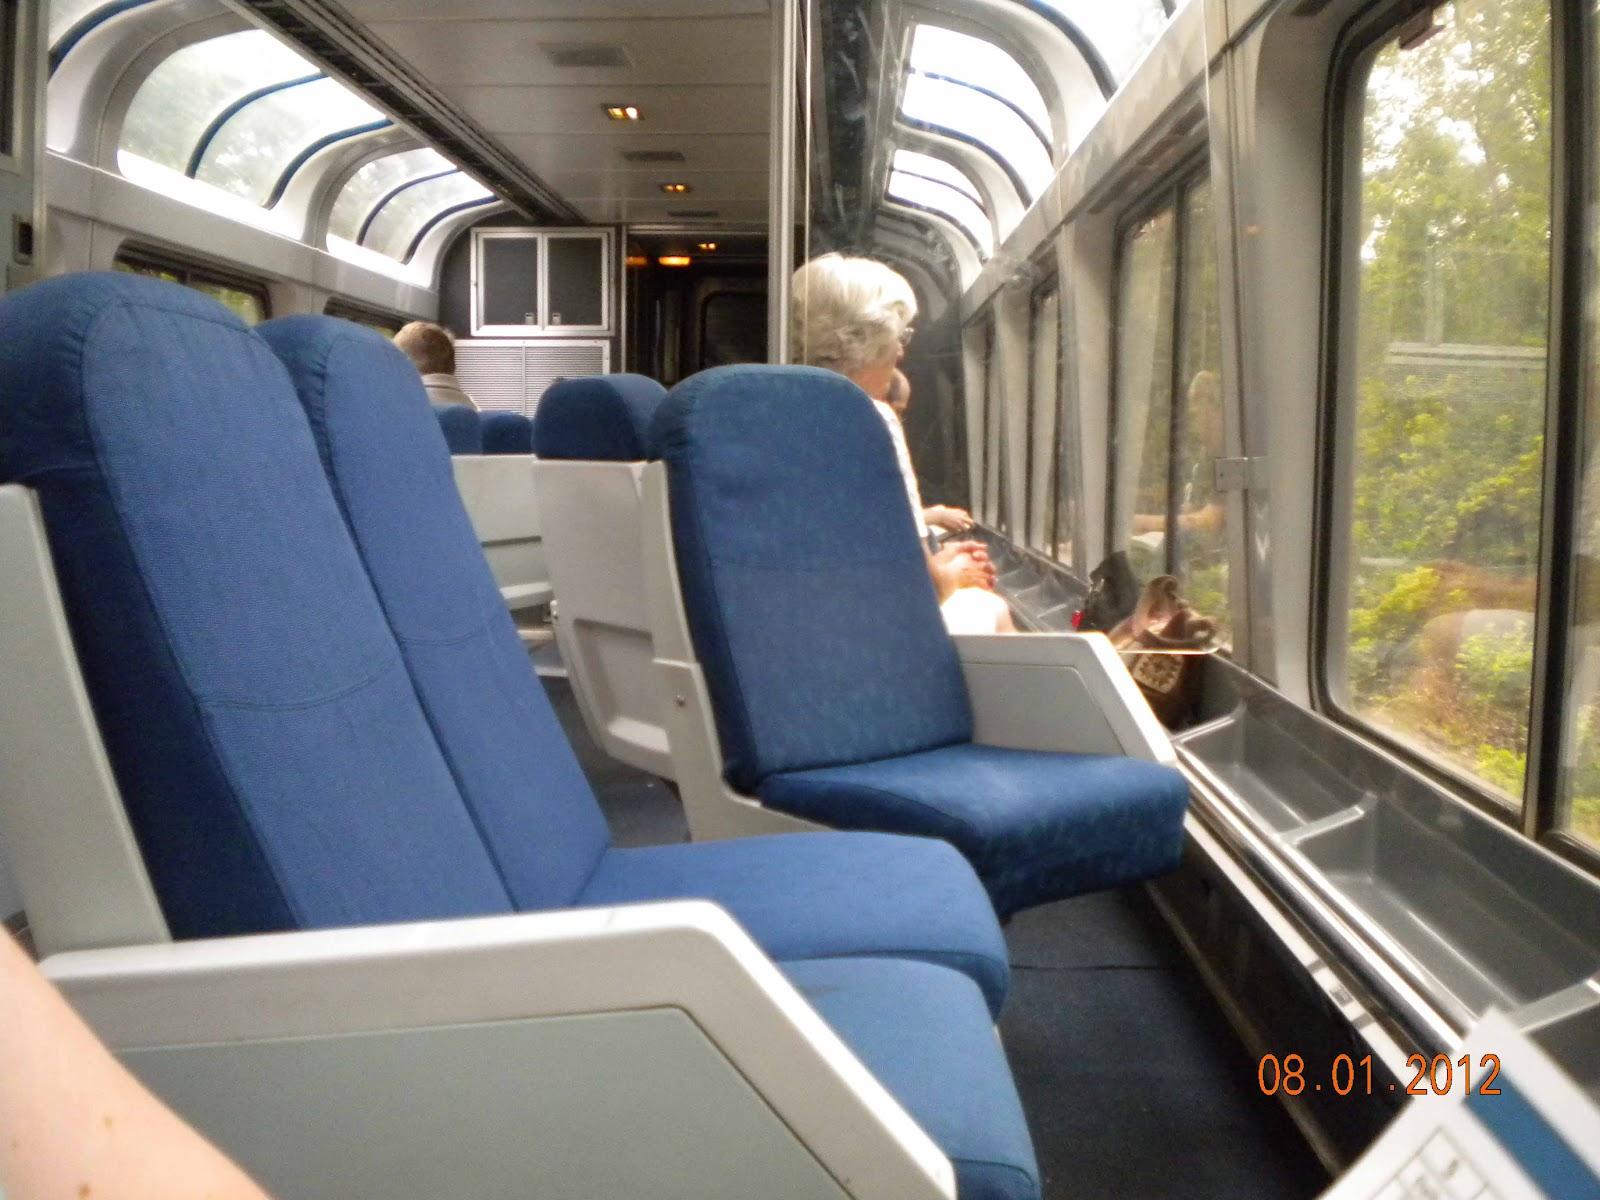 Jex Reviews California Zephyr Amtrack Superliner